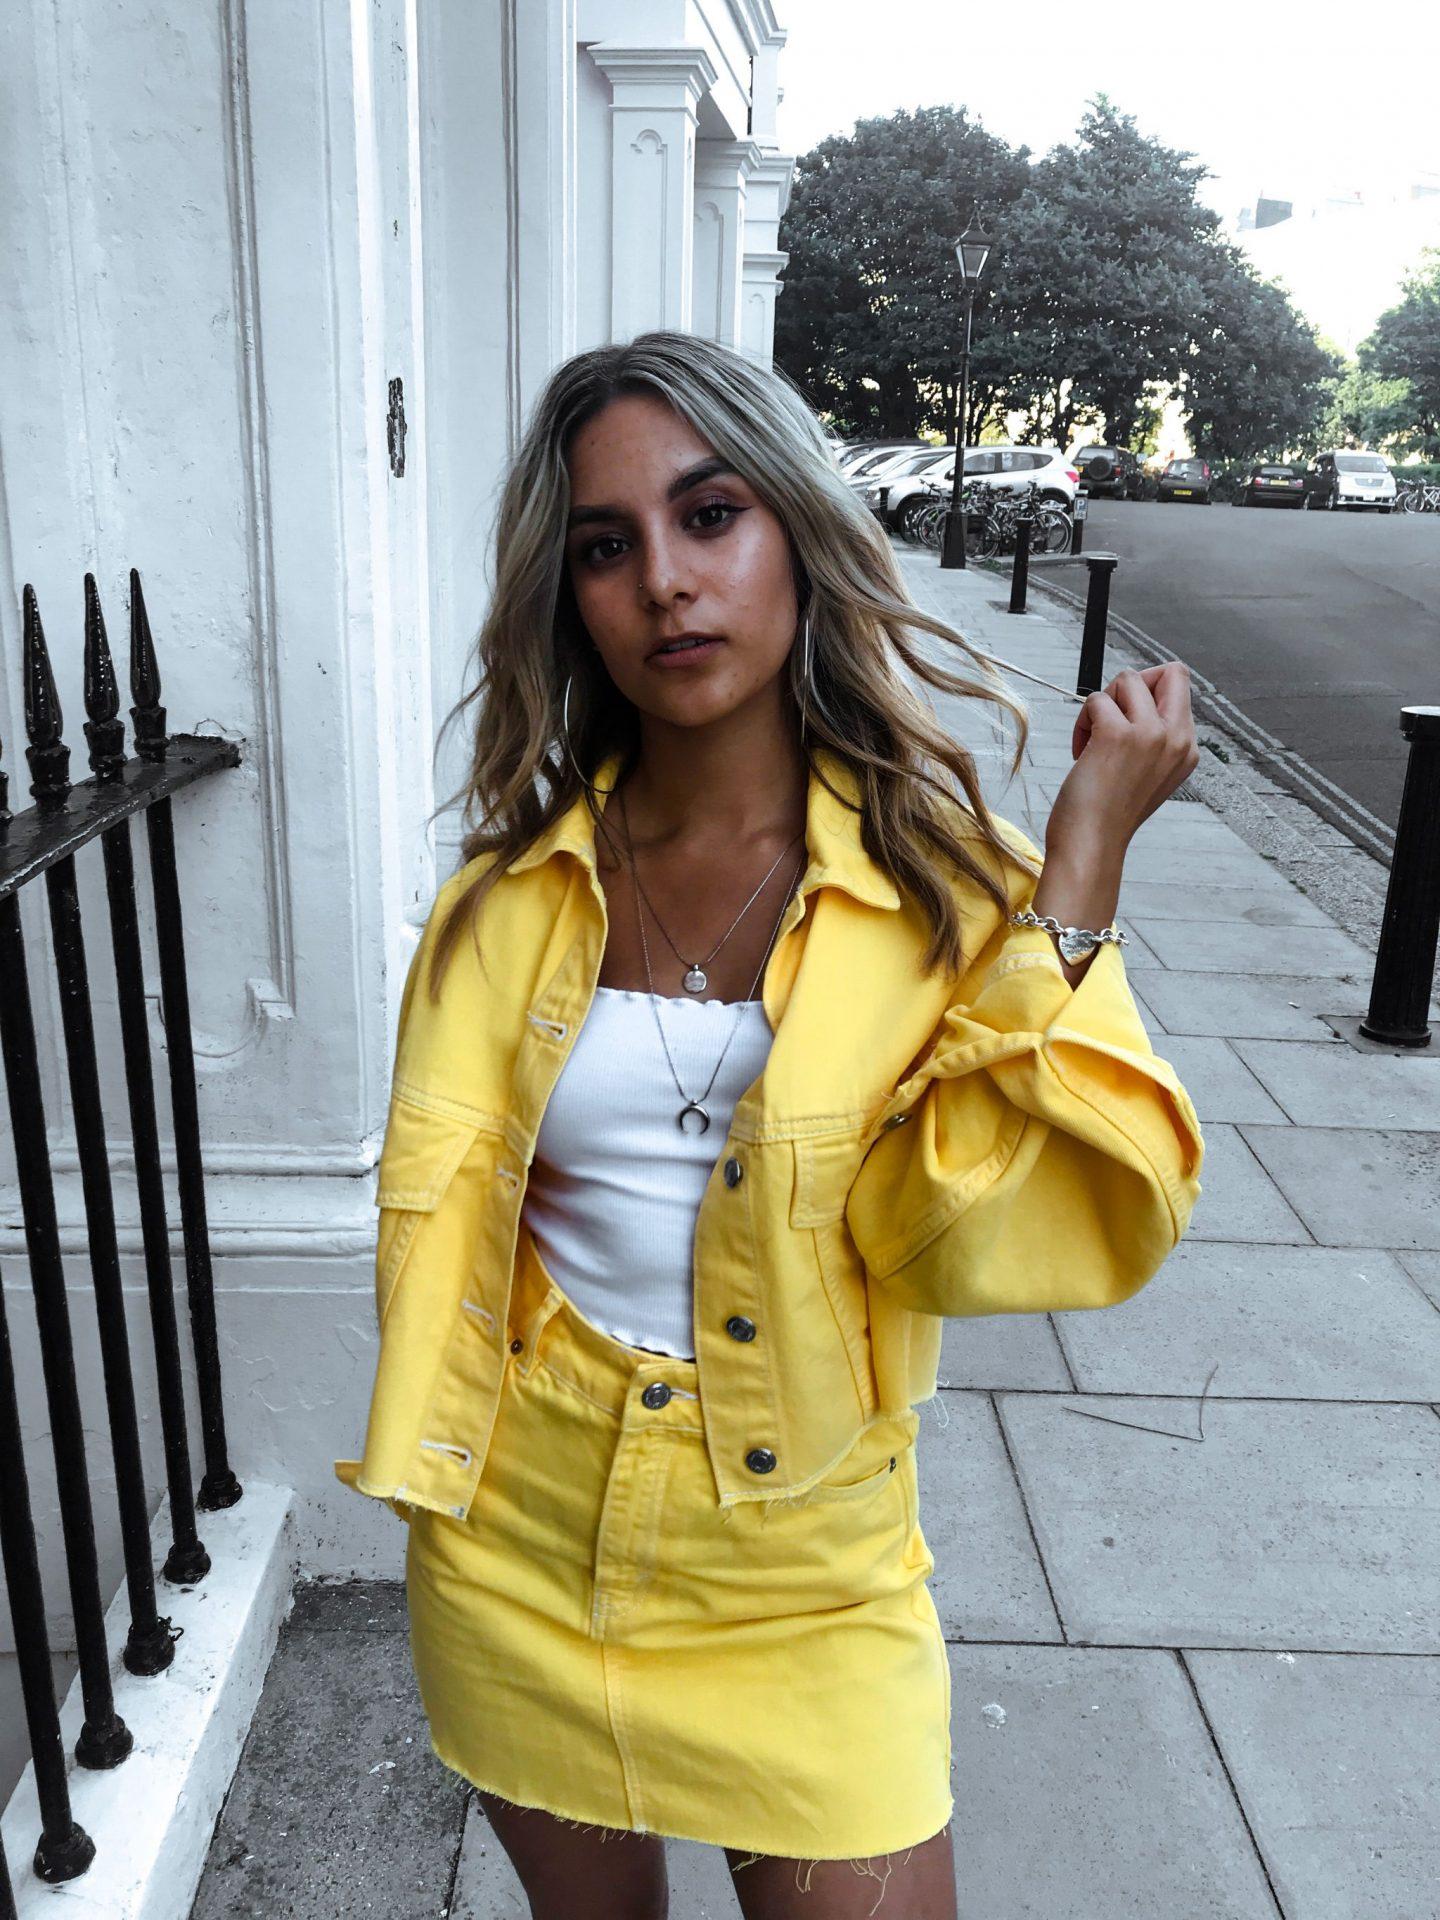 yasmin stefanie topshop yellow denim co ord ciara chunky trainers summer ss18 trends